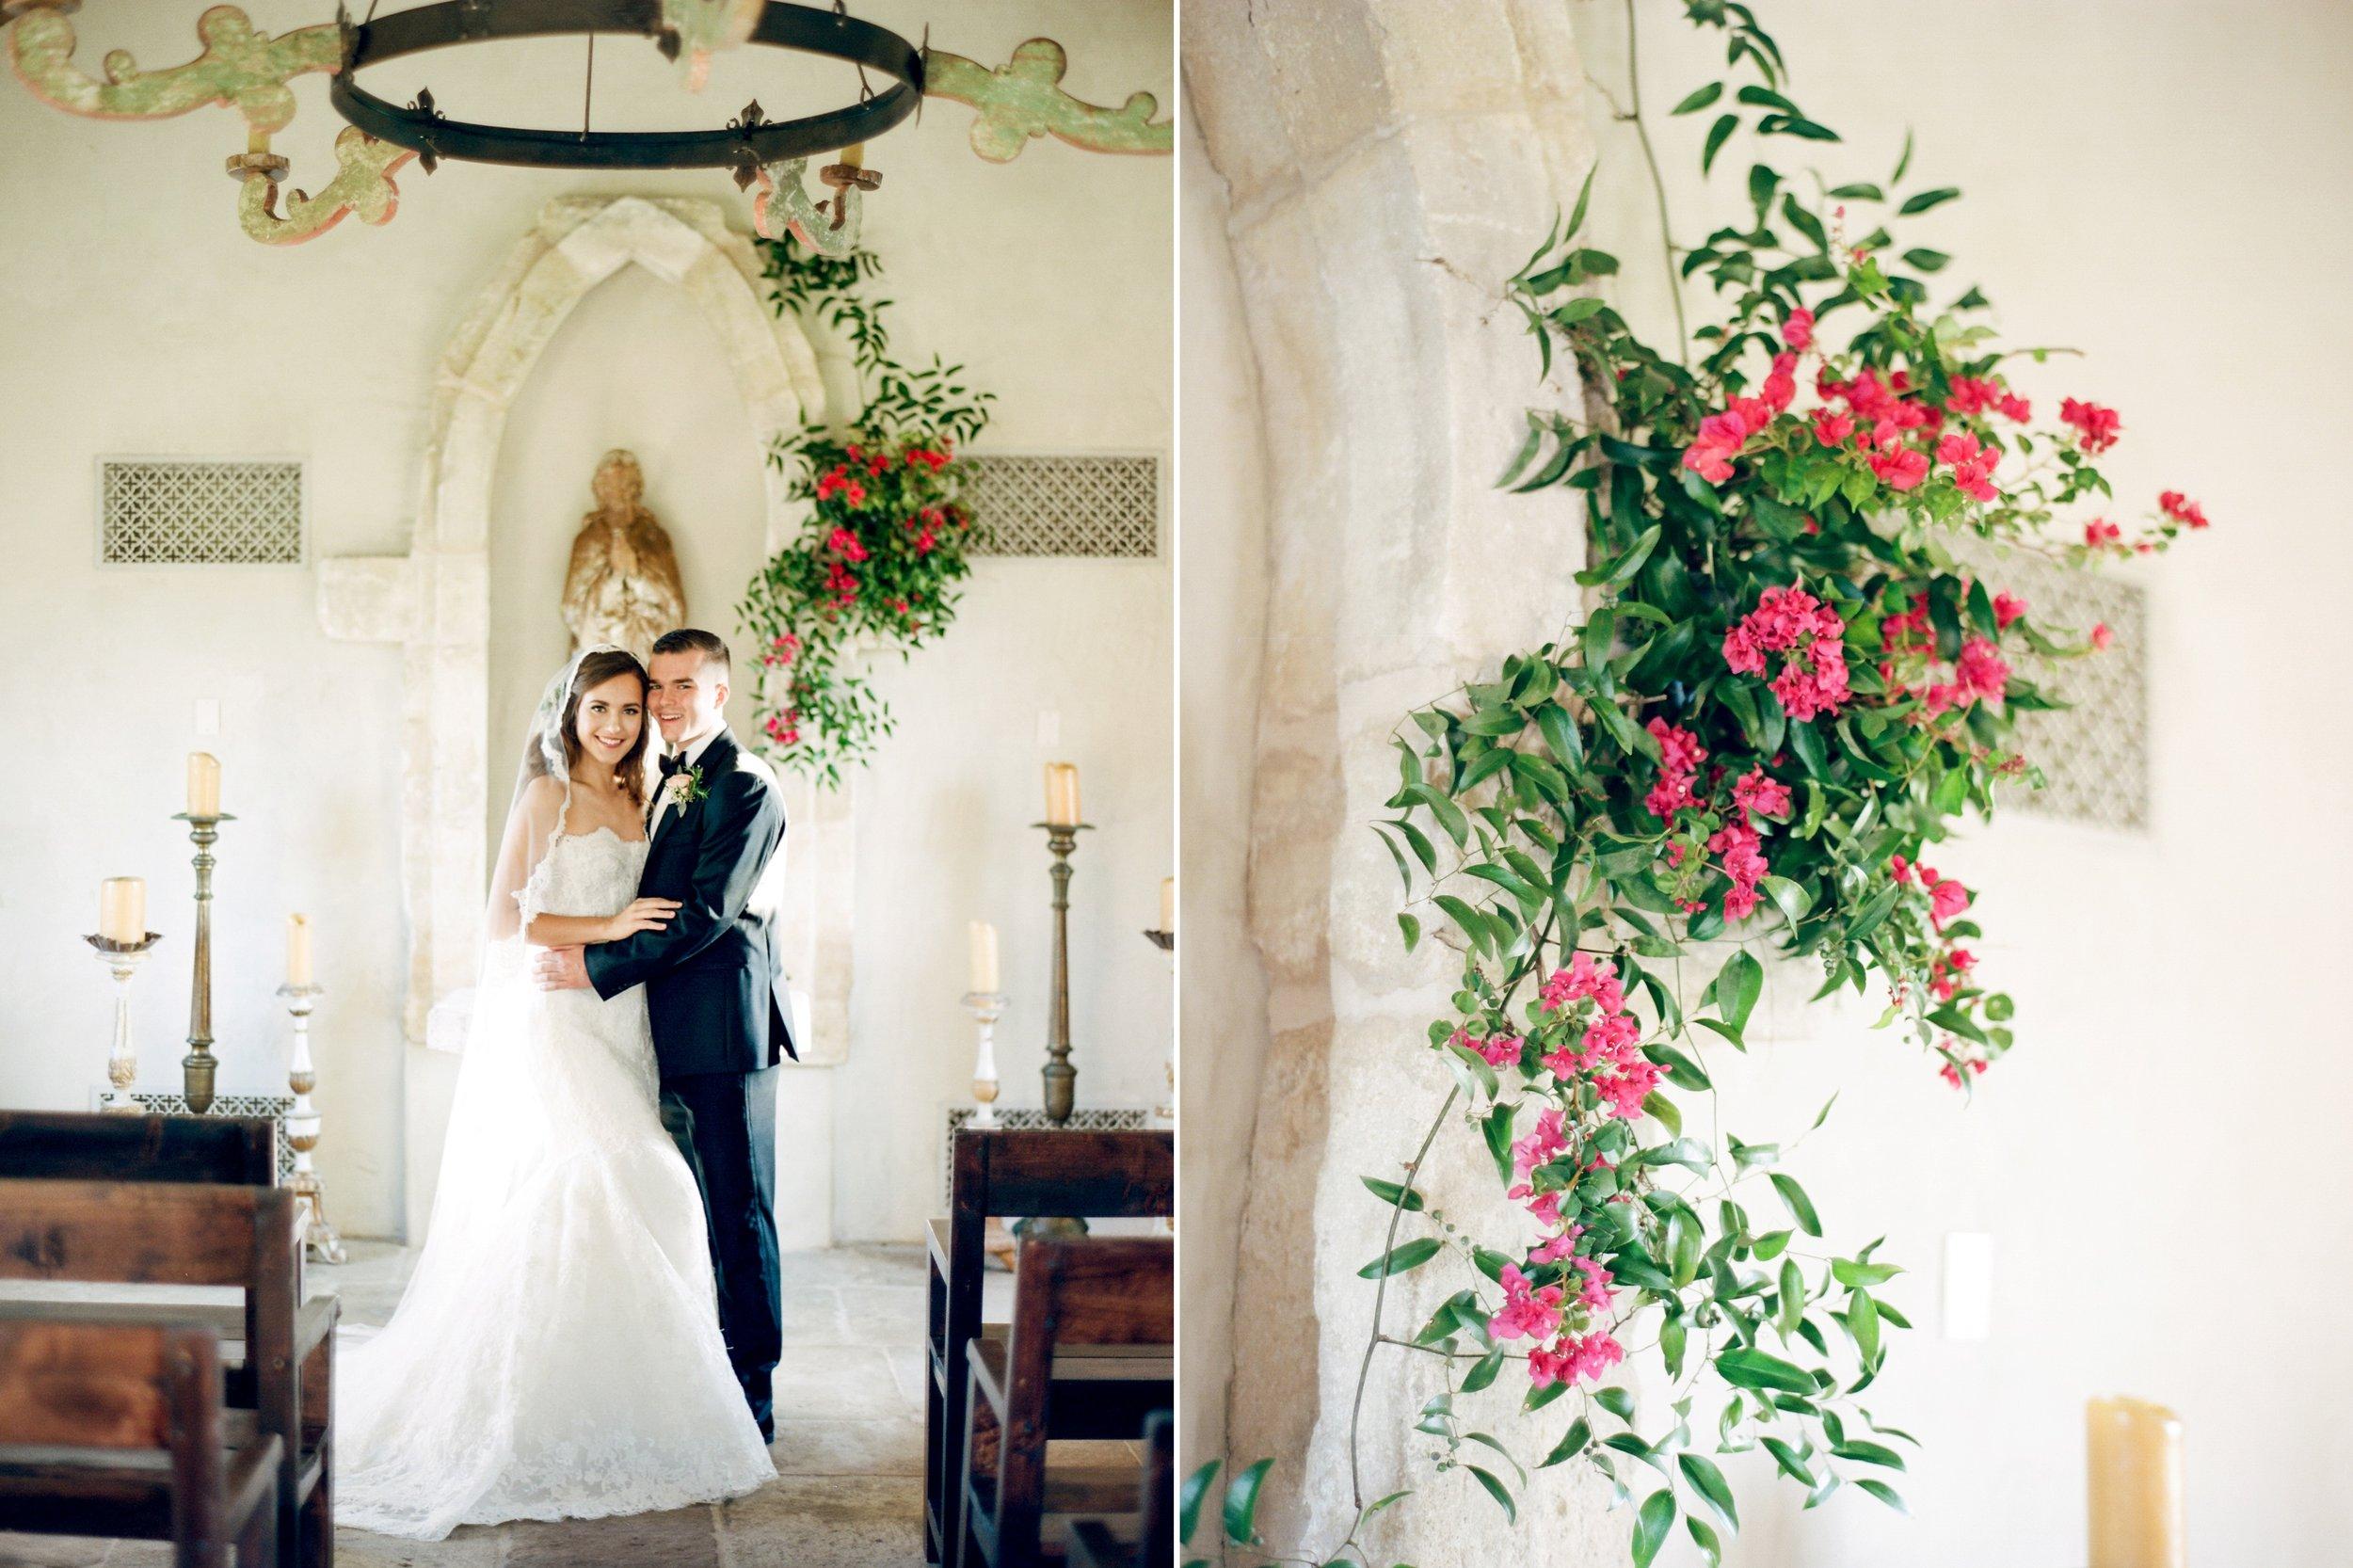 the-clubs-at-houston-oaks-wedding-houston-oaks-wedding-ceremony-houston-oaks-chapel-belle-of-the-ball-dana-fernandez-photography-houston-wedding-photographer-luxury-film-fine-art-104.jpg